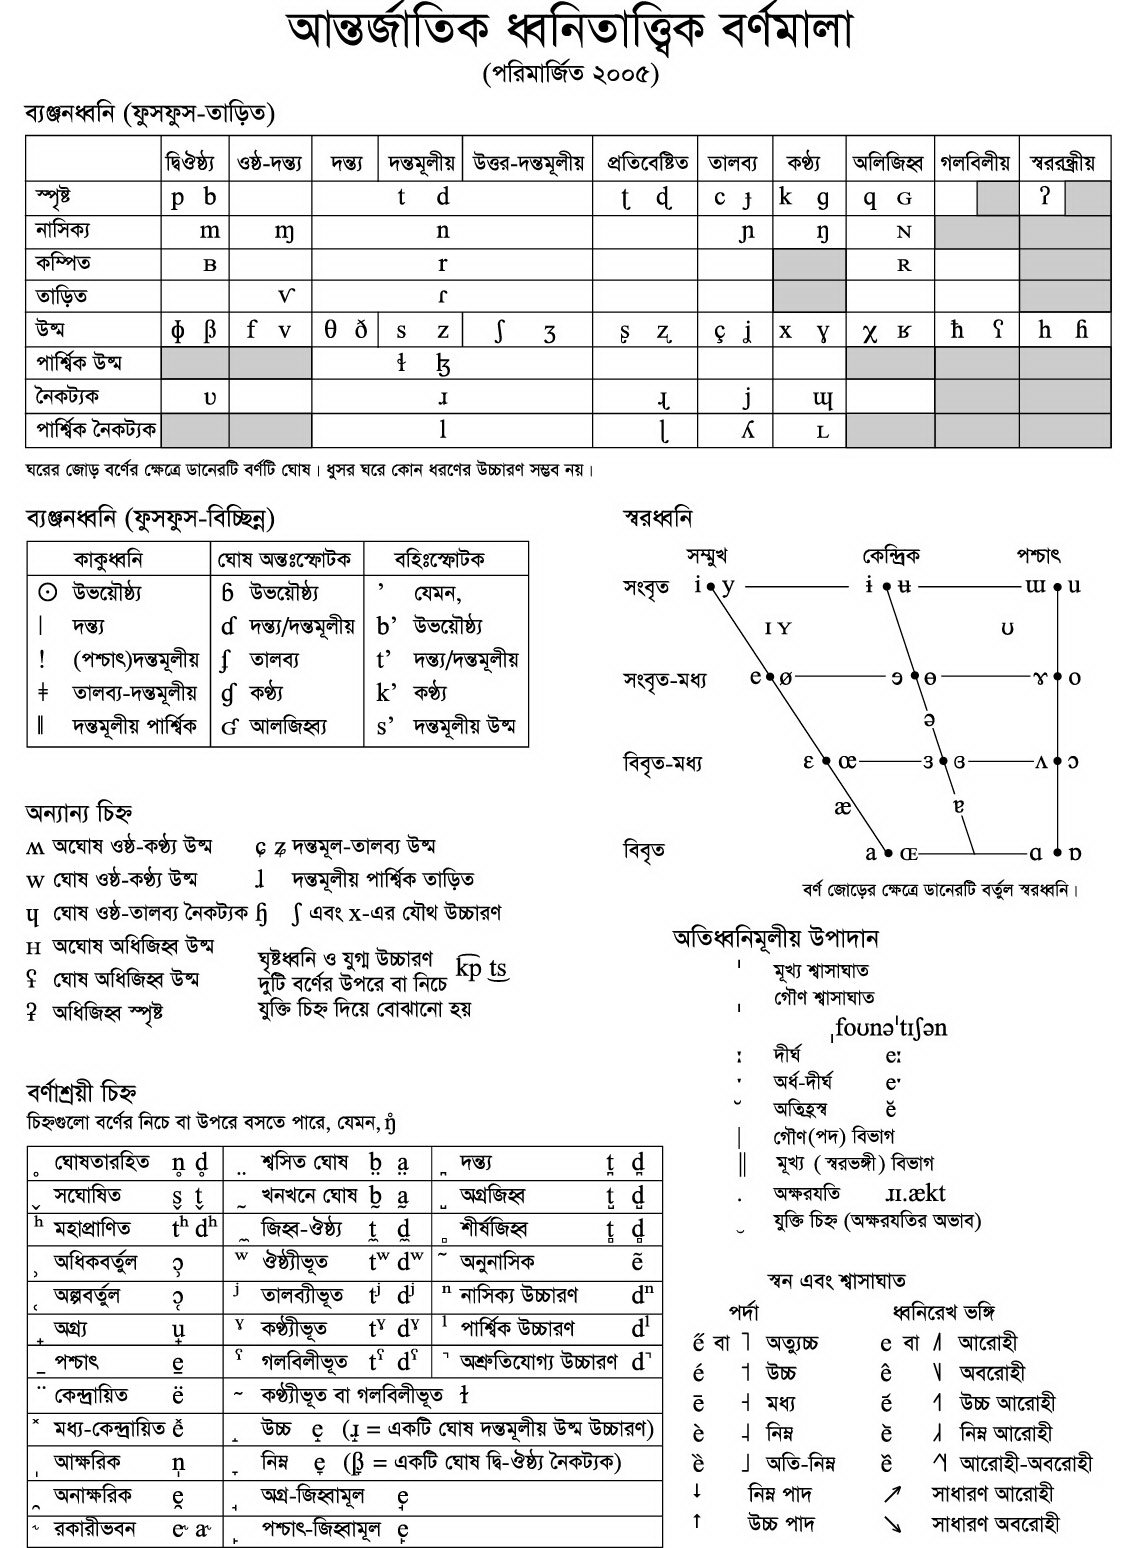 FileIPA chart 2005 bnpng Wikimedia Commons – Ipa Chart